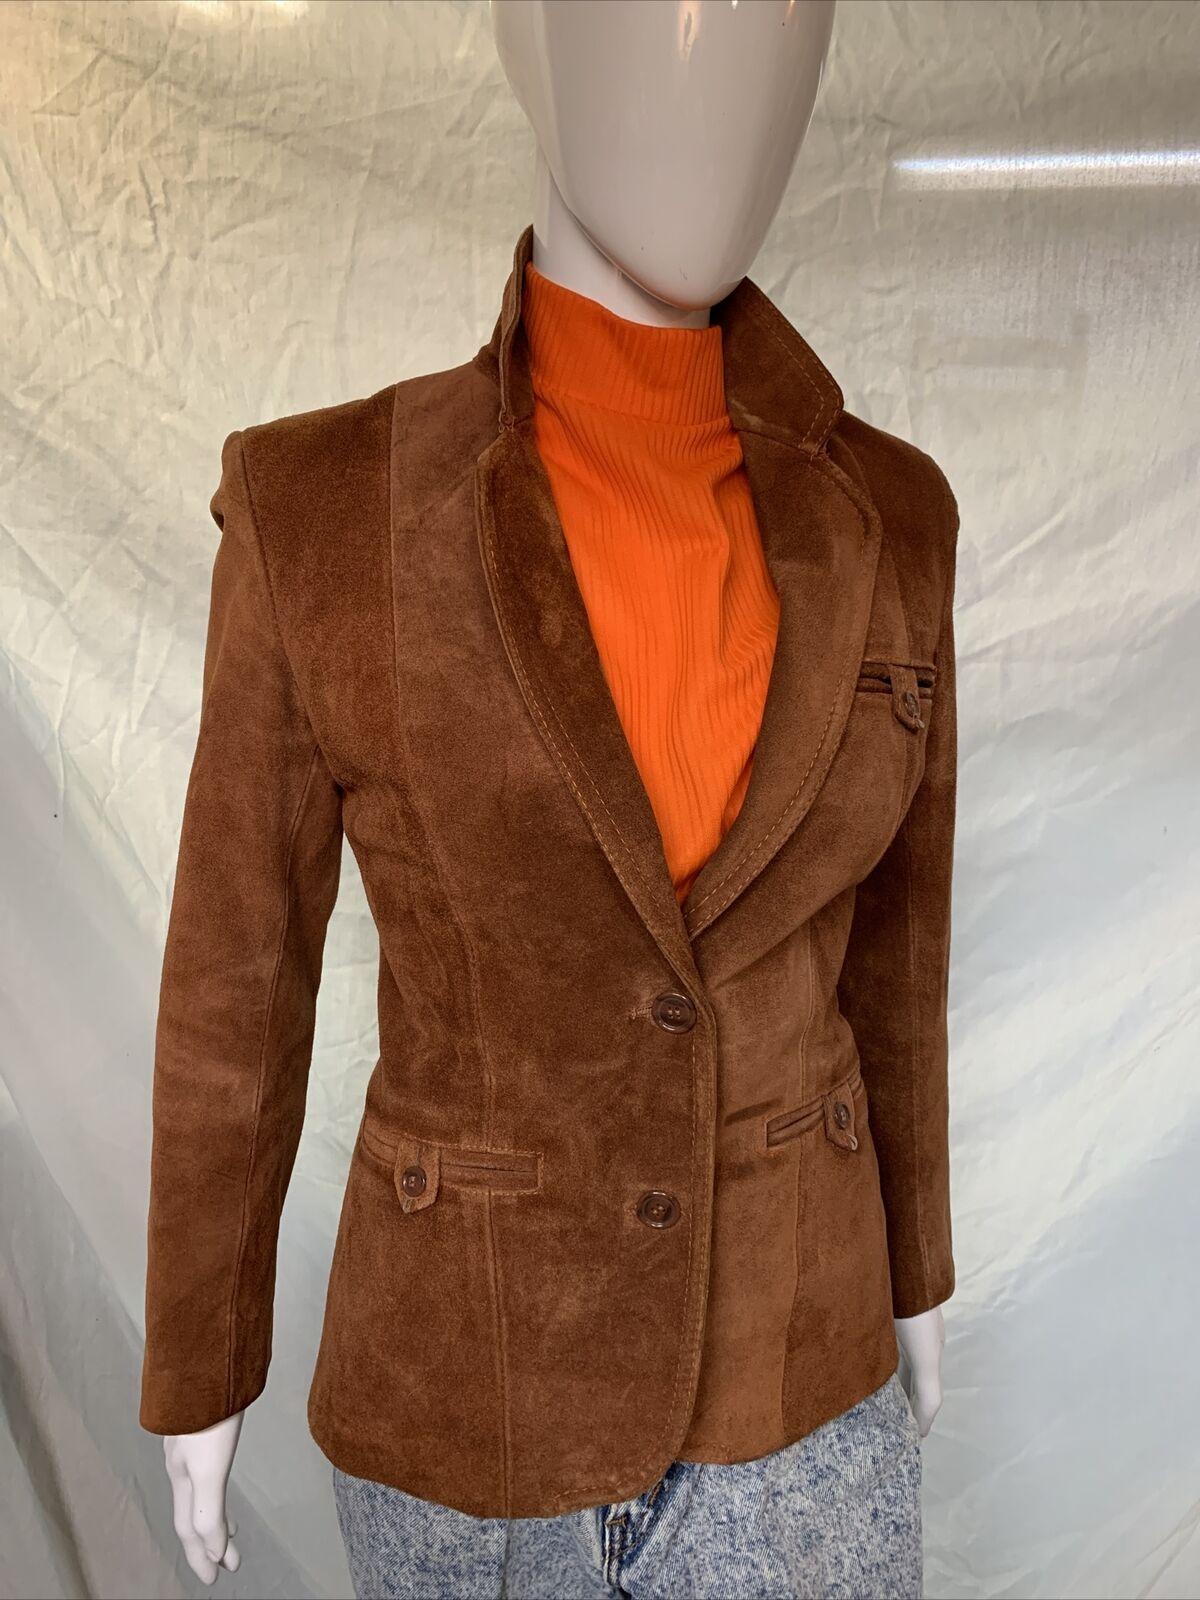 Vintage 1970s Casual Corner Leather Suede Brown J… - image 2